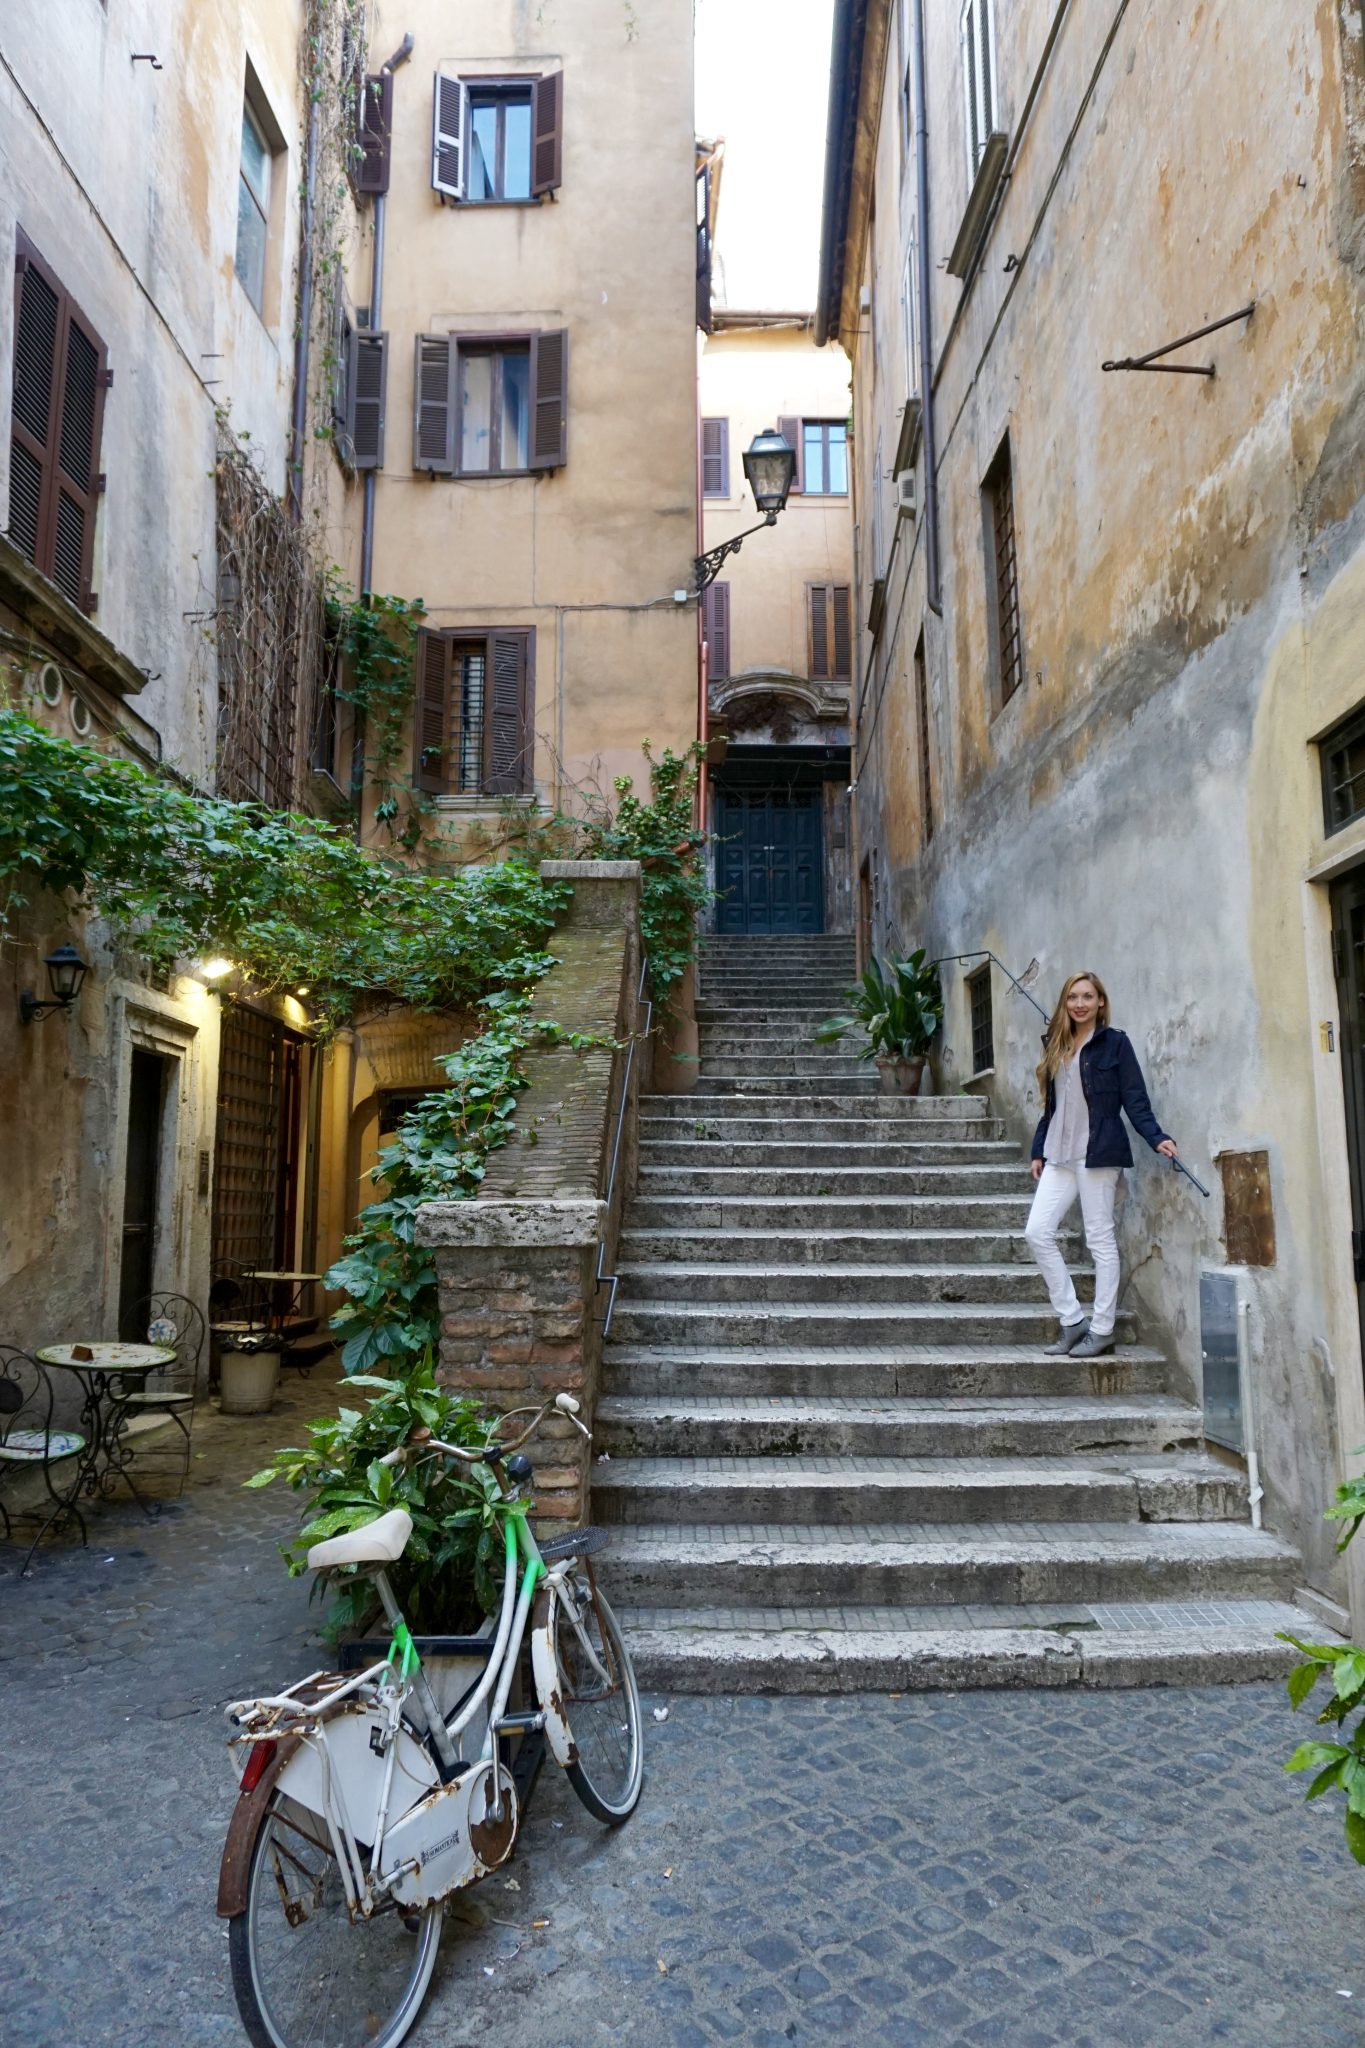 Rome alleyways, Italy